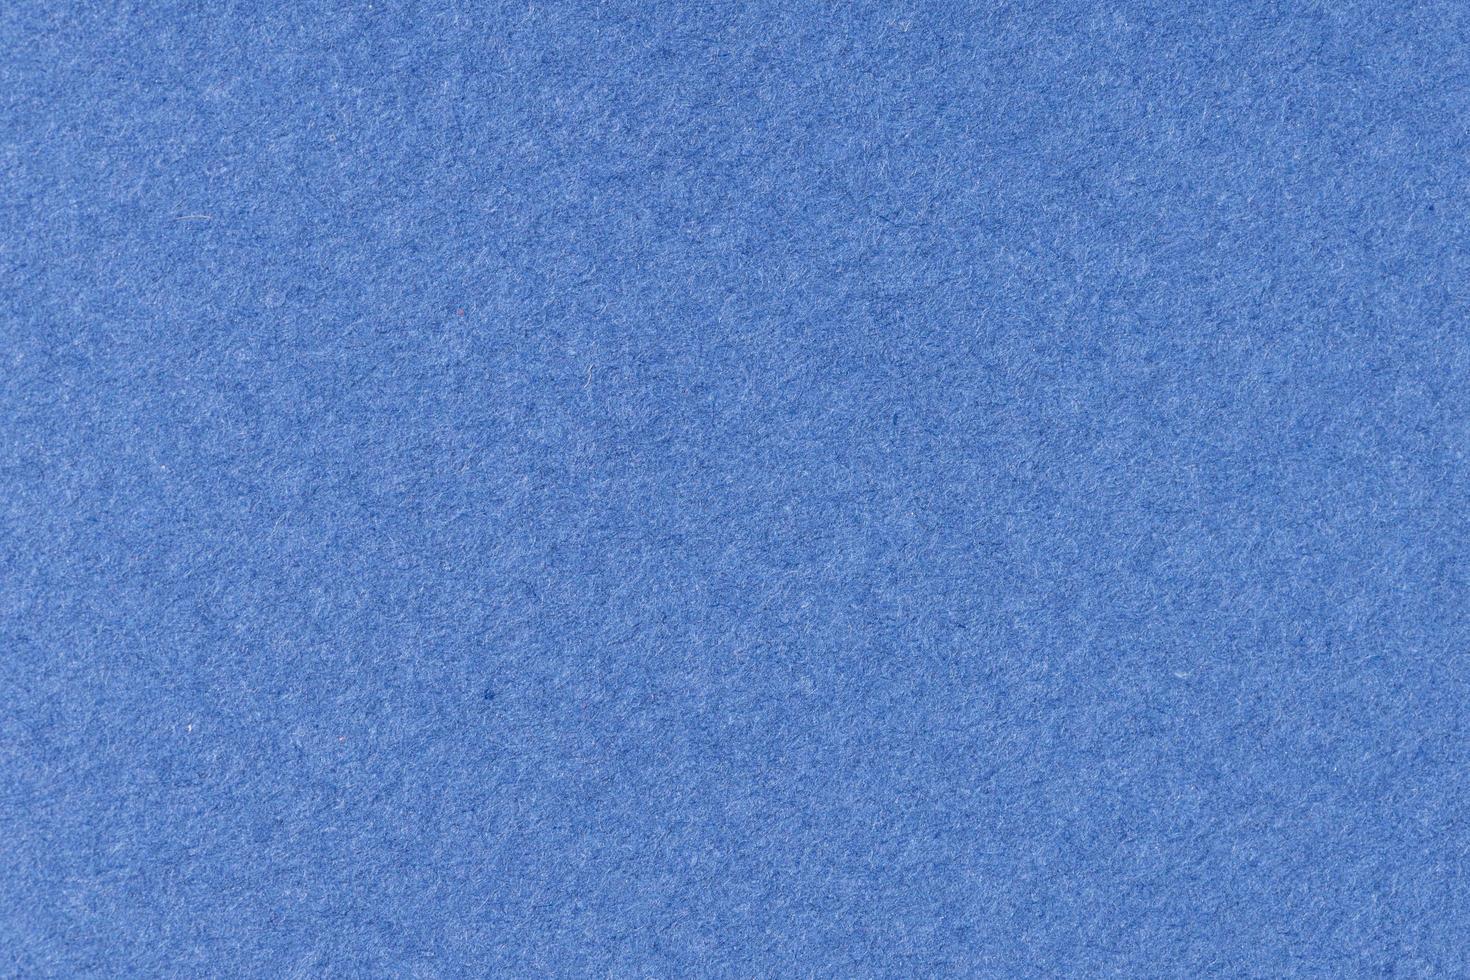 blå texturerat papper bakgrund. full ram foto